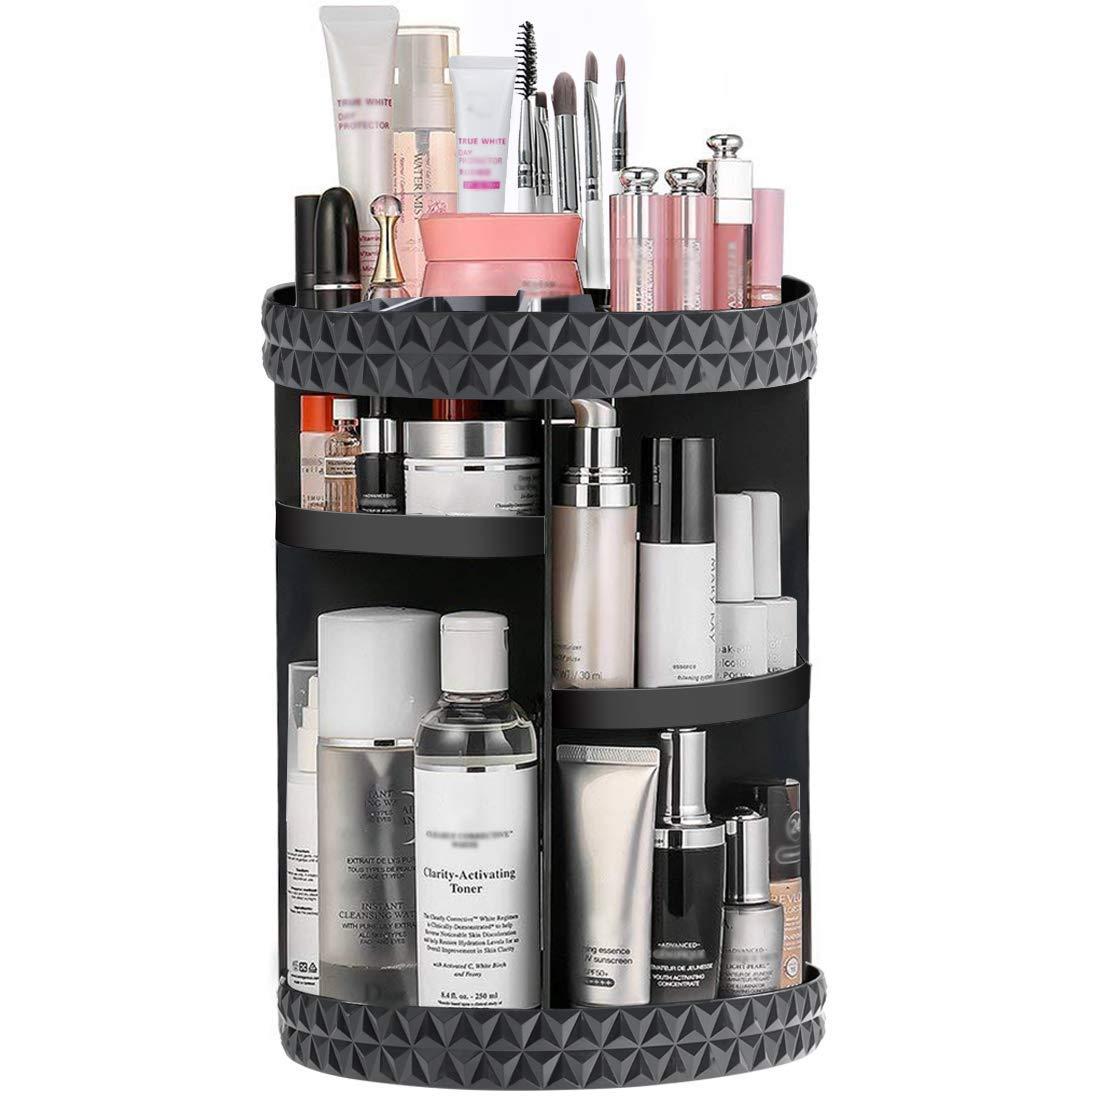 360-degree Rotating Makeup Organizer, DIY Adjustable Makeup Carousel Spinning Holder Storage Rack, Large Capacity Make up Caddy Shelf Cosmetics Organizer Box